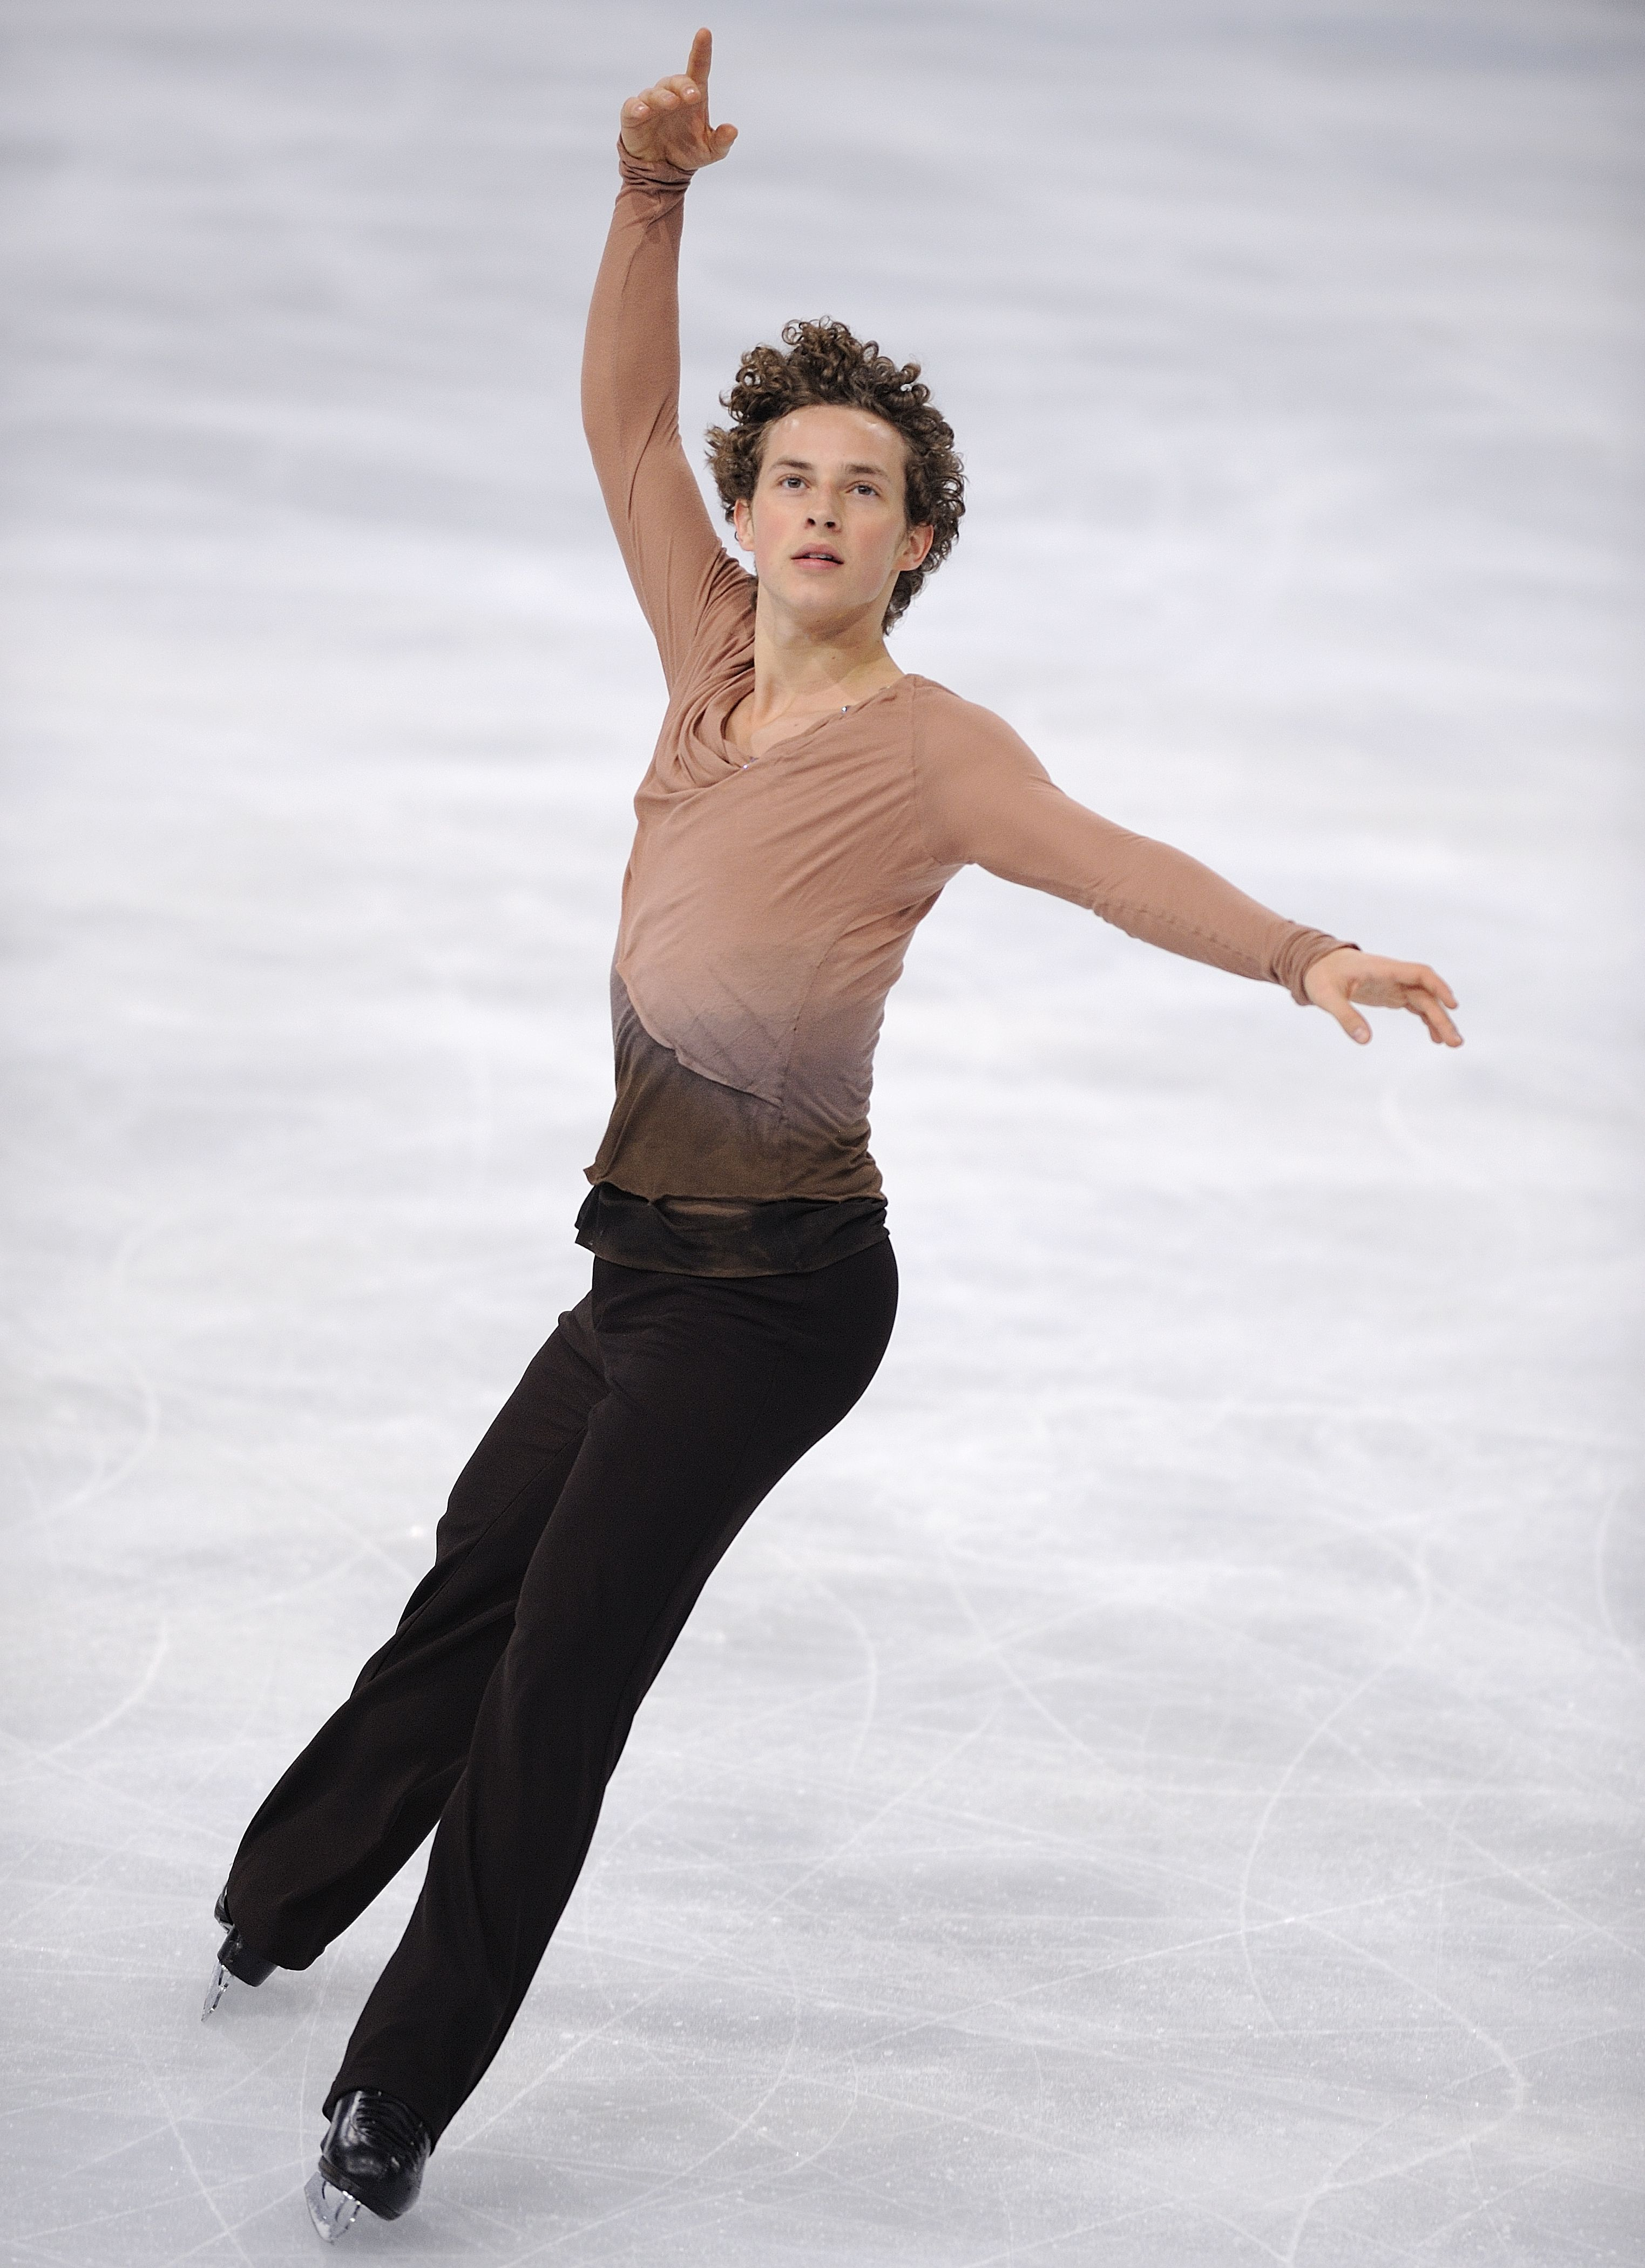 adam rippon men s figure skating ice skating dress inspiration adam rippon men s figure skating ice skating dress inspiration for sk8 gr8 designs